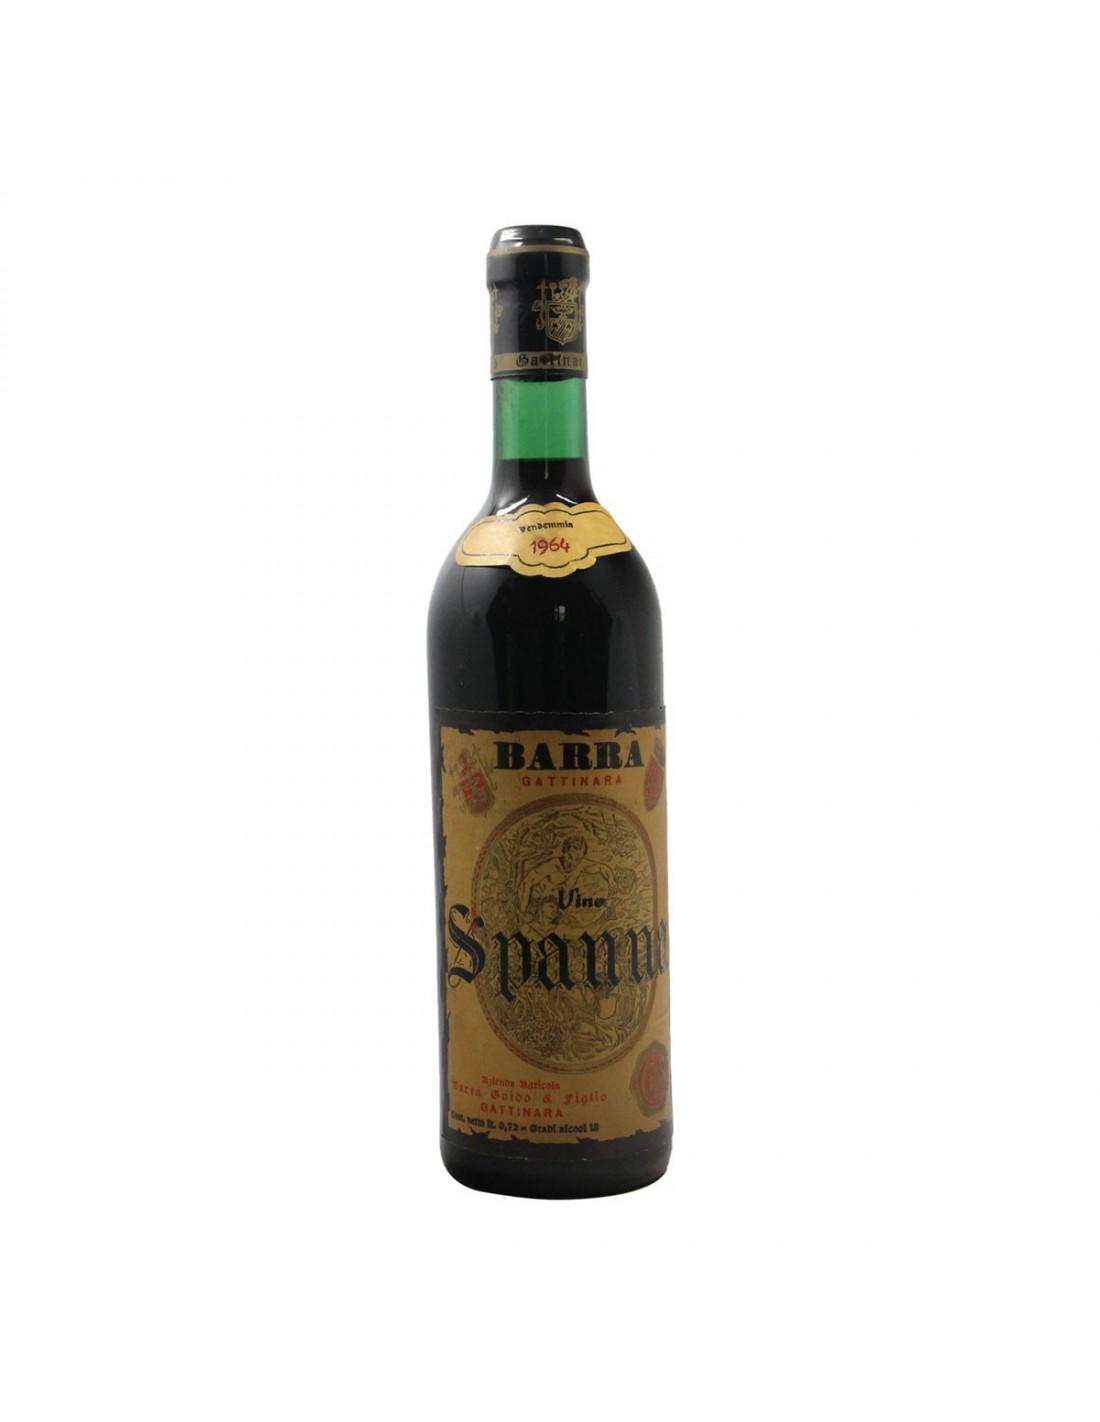 SPANNA 1964 BARRA GUIDO Grandi Bottiglie